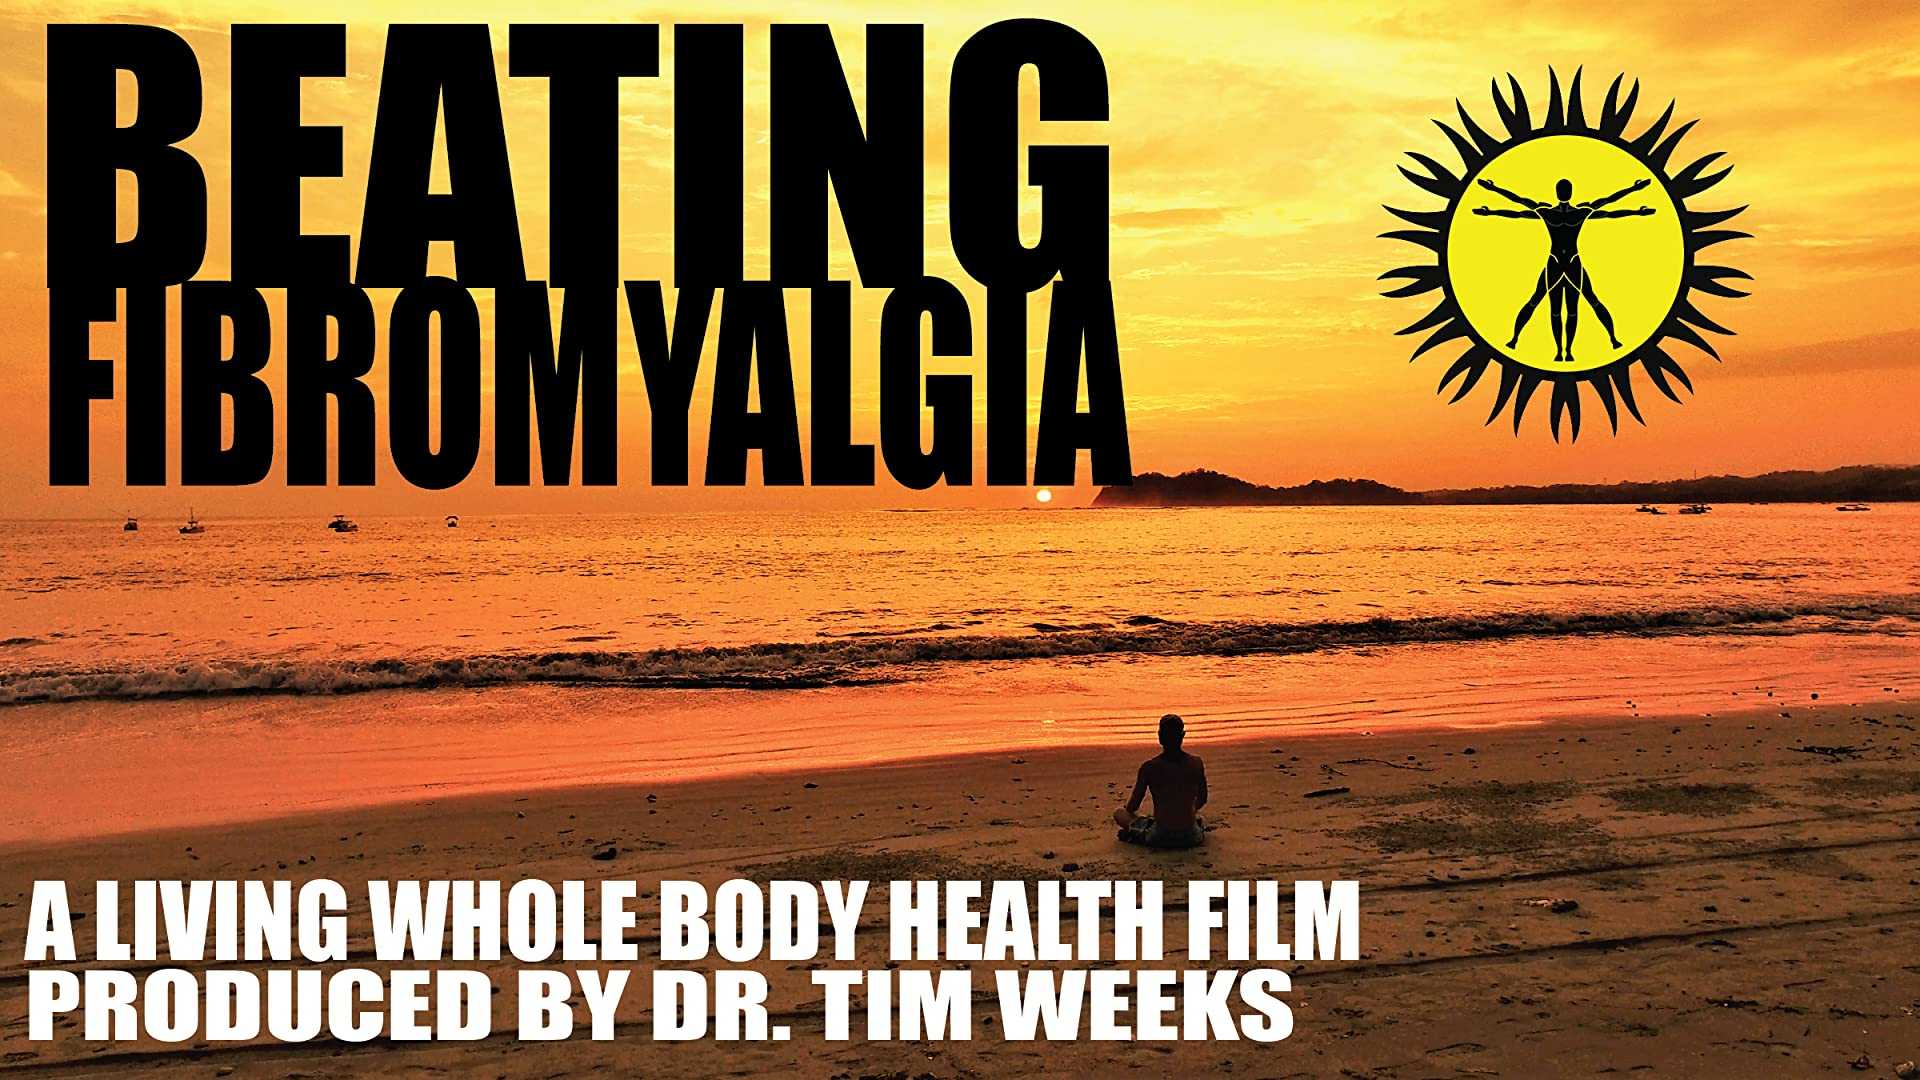 Beating Fibromyalgia